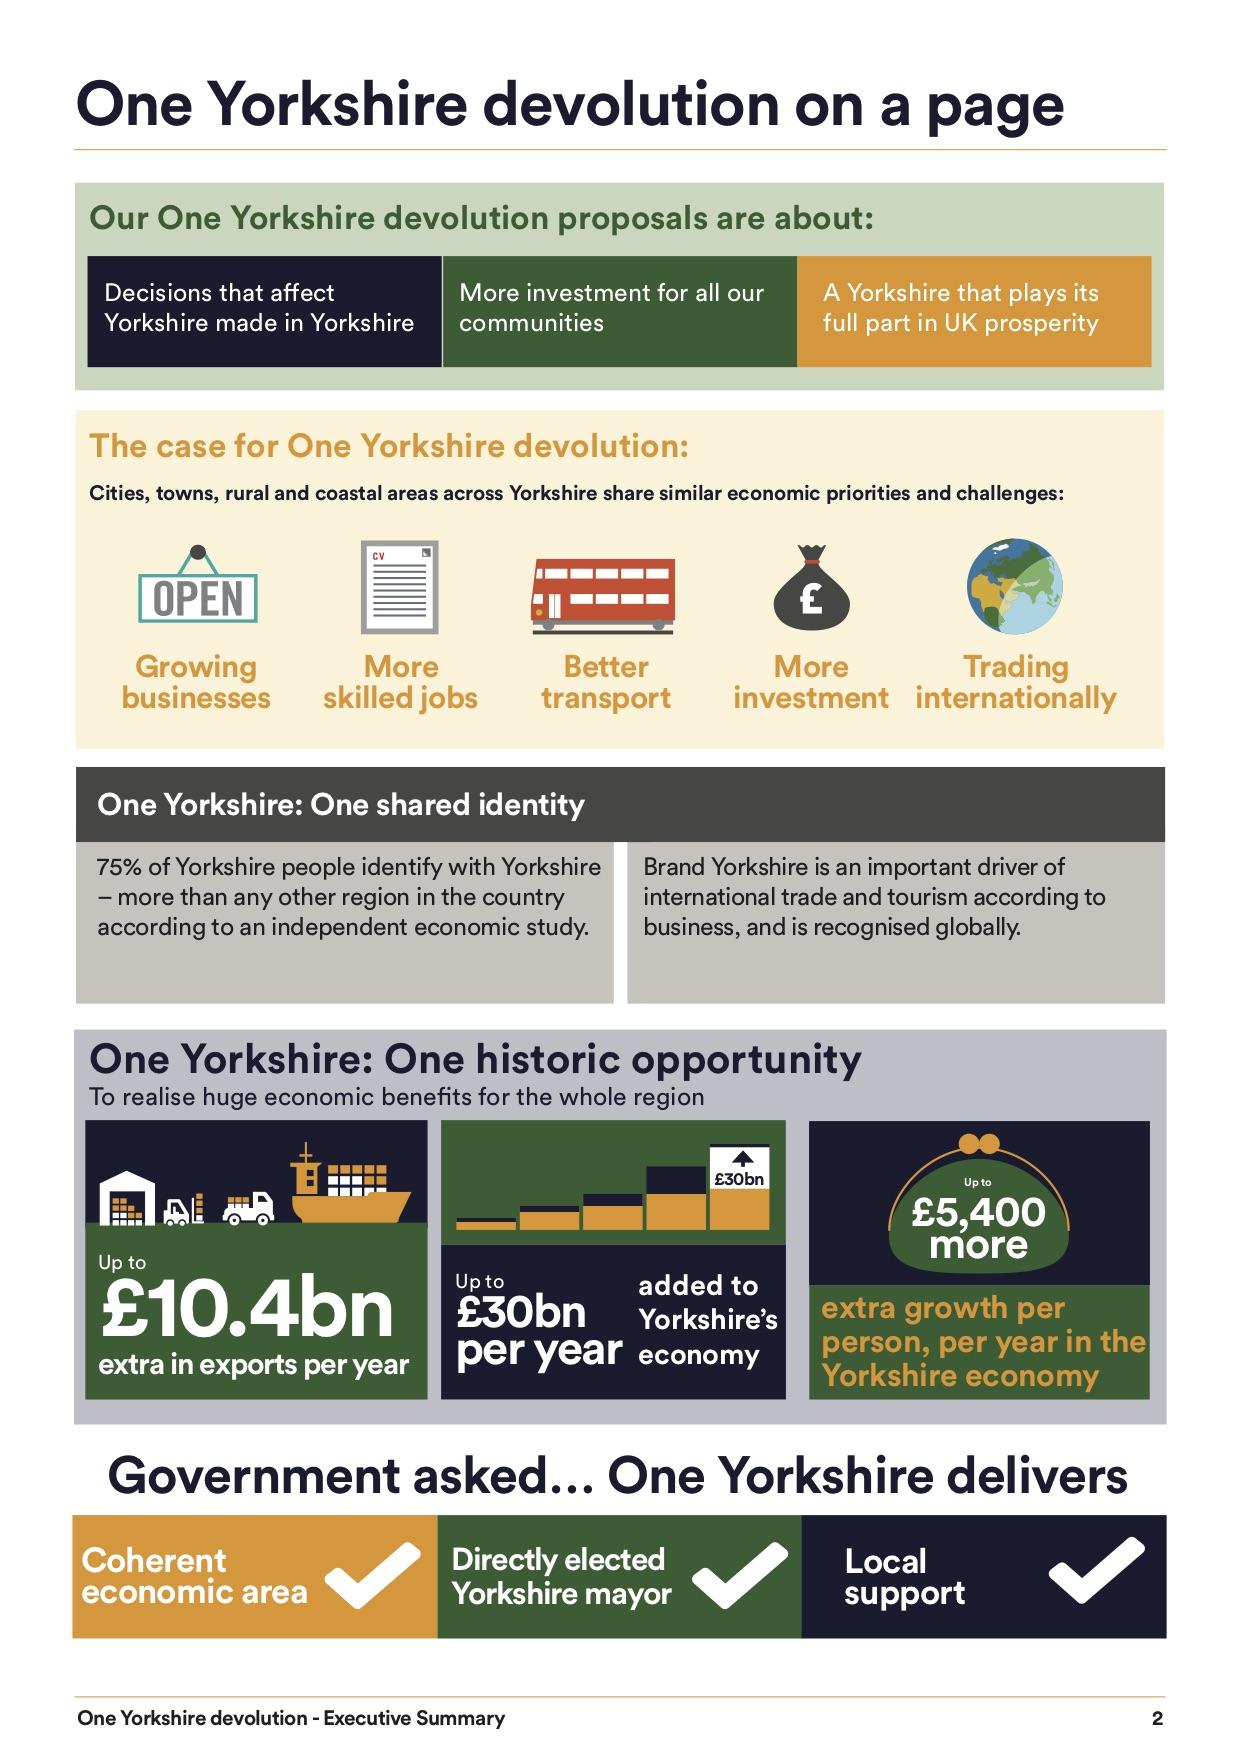 Full One Yorkshire summary  here.